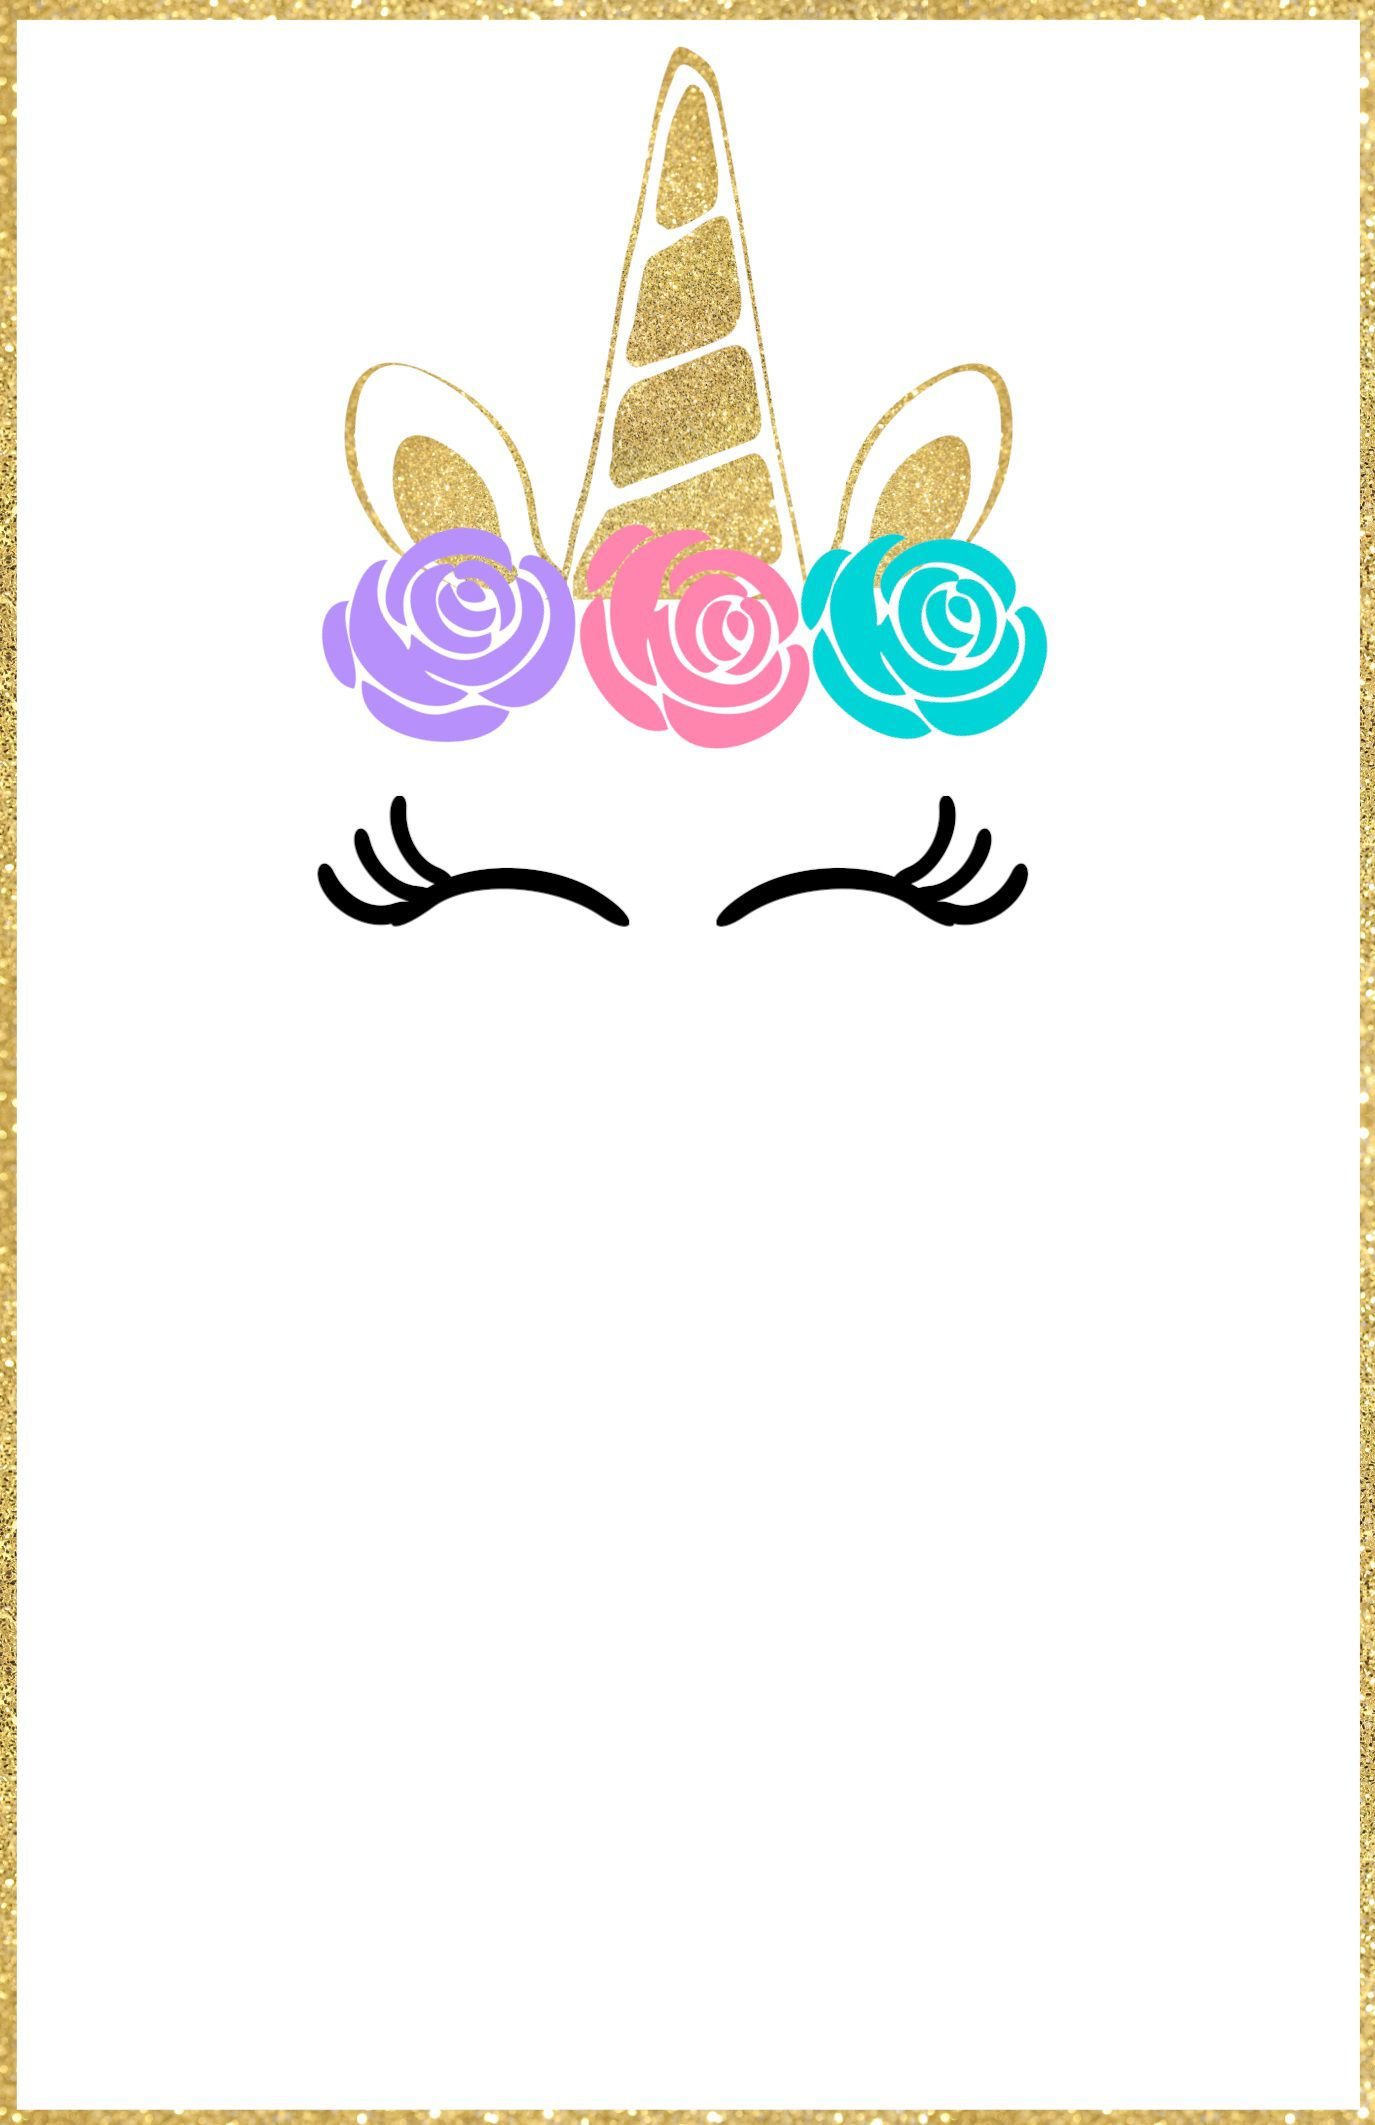 011 Fearsome Unicorn Baby Shower Template Free Download Idea  Printable InvitationFull